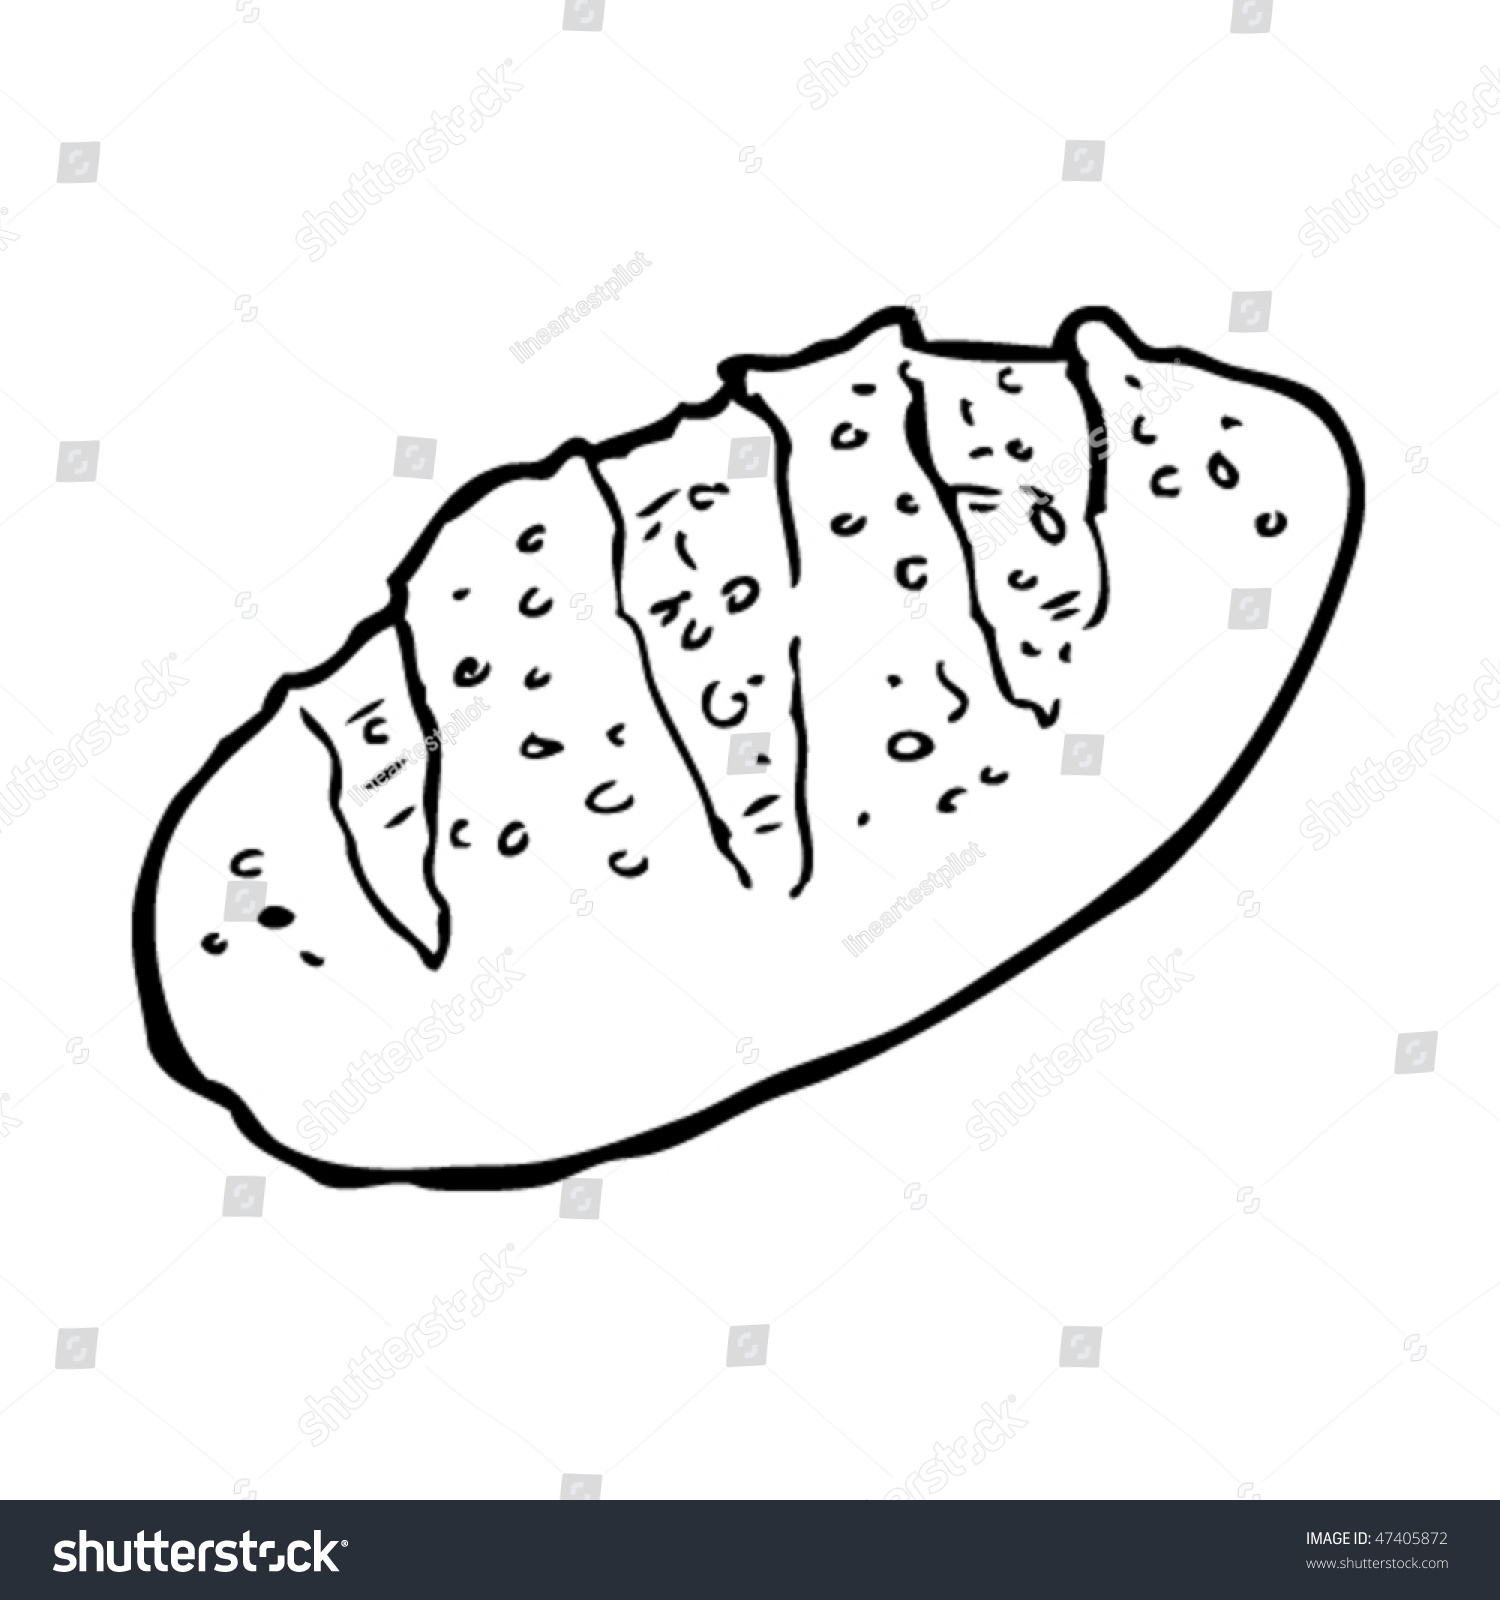 Uncategorized Loaf Of Bread Drawing drawing loaf bread stock vector 47405872 shutterstock of a bread